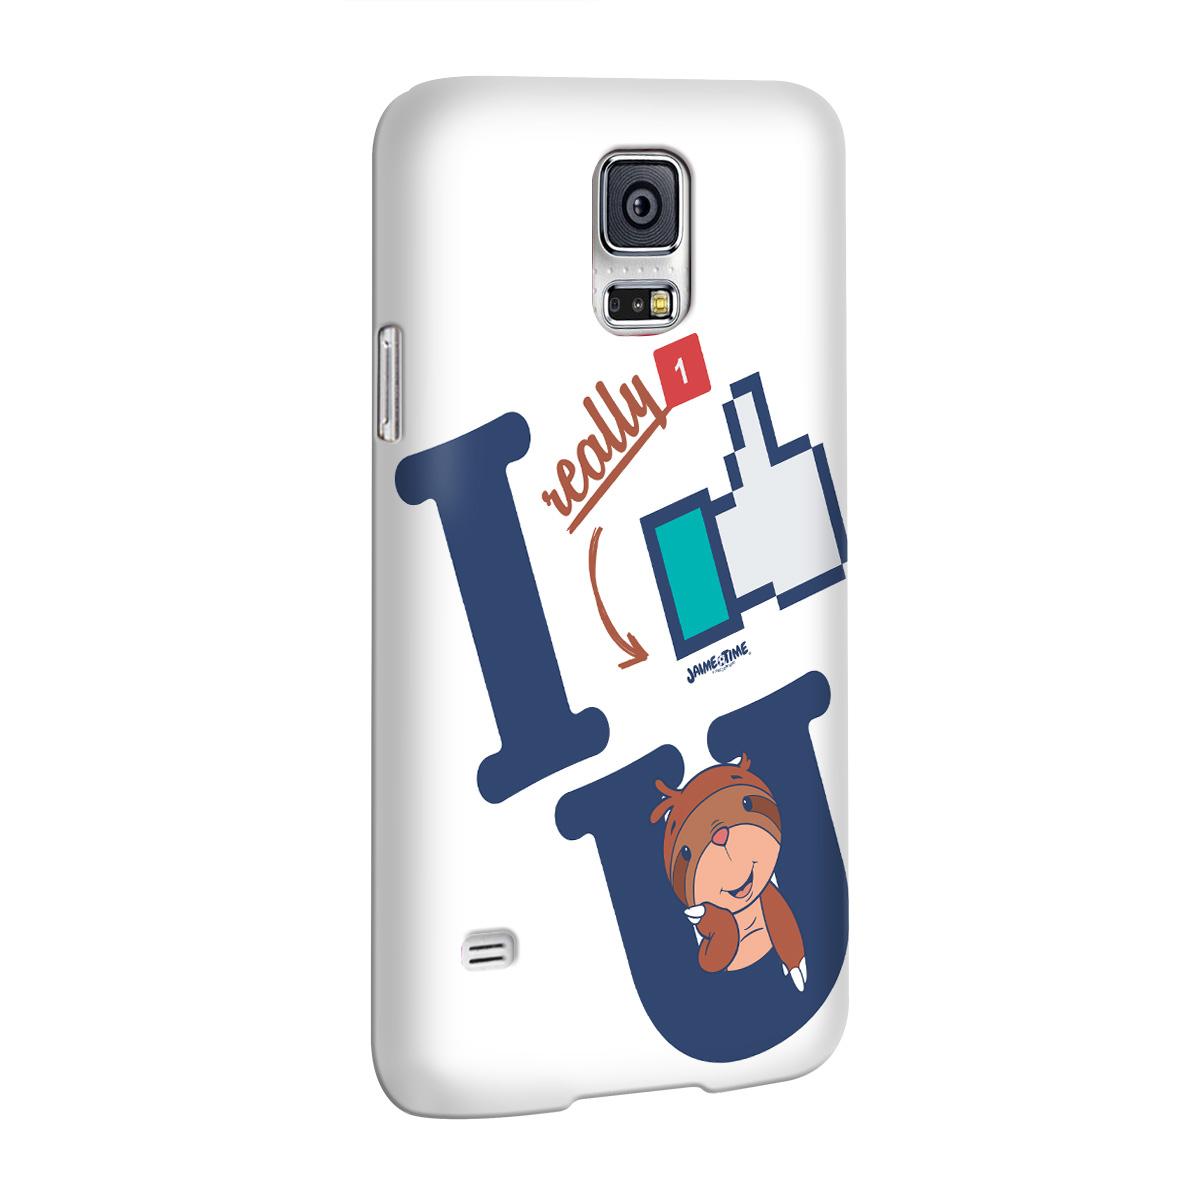 Capa para Samsung Galaxy S5 Jaime I Like You